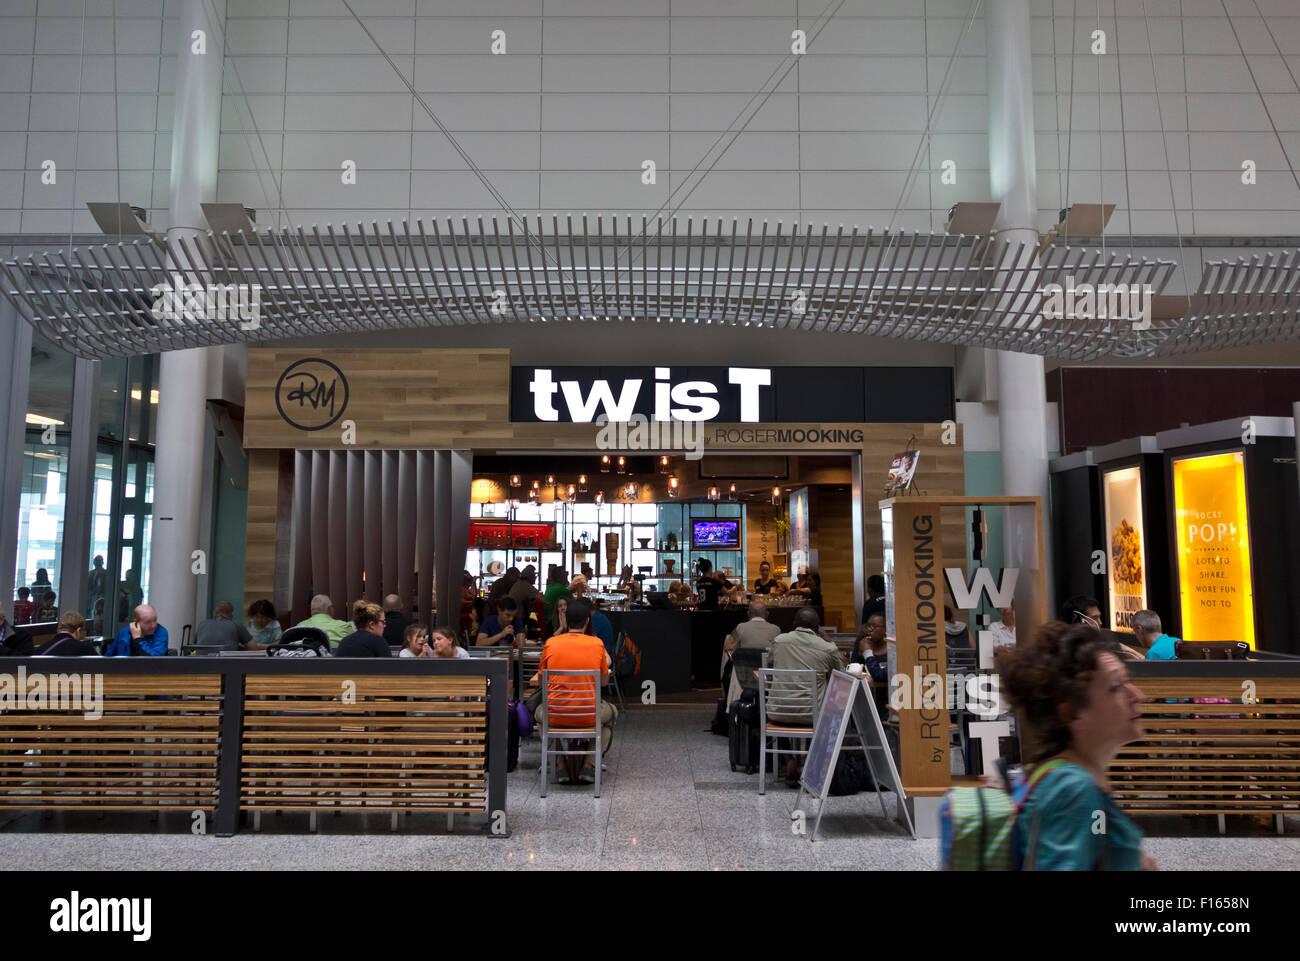 Restaurant Twist à l'aéroport international Pearson de Toronto, Ontario, Canada. Photo Stock